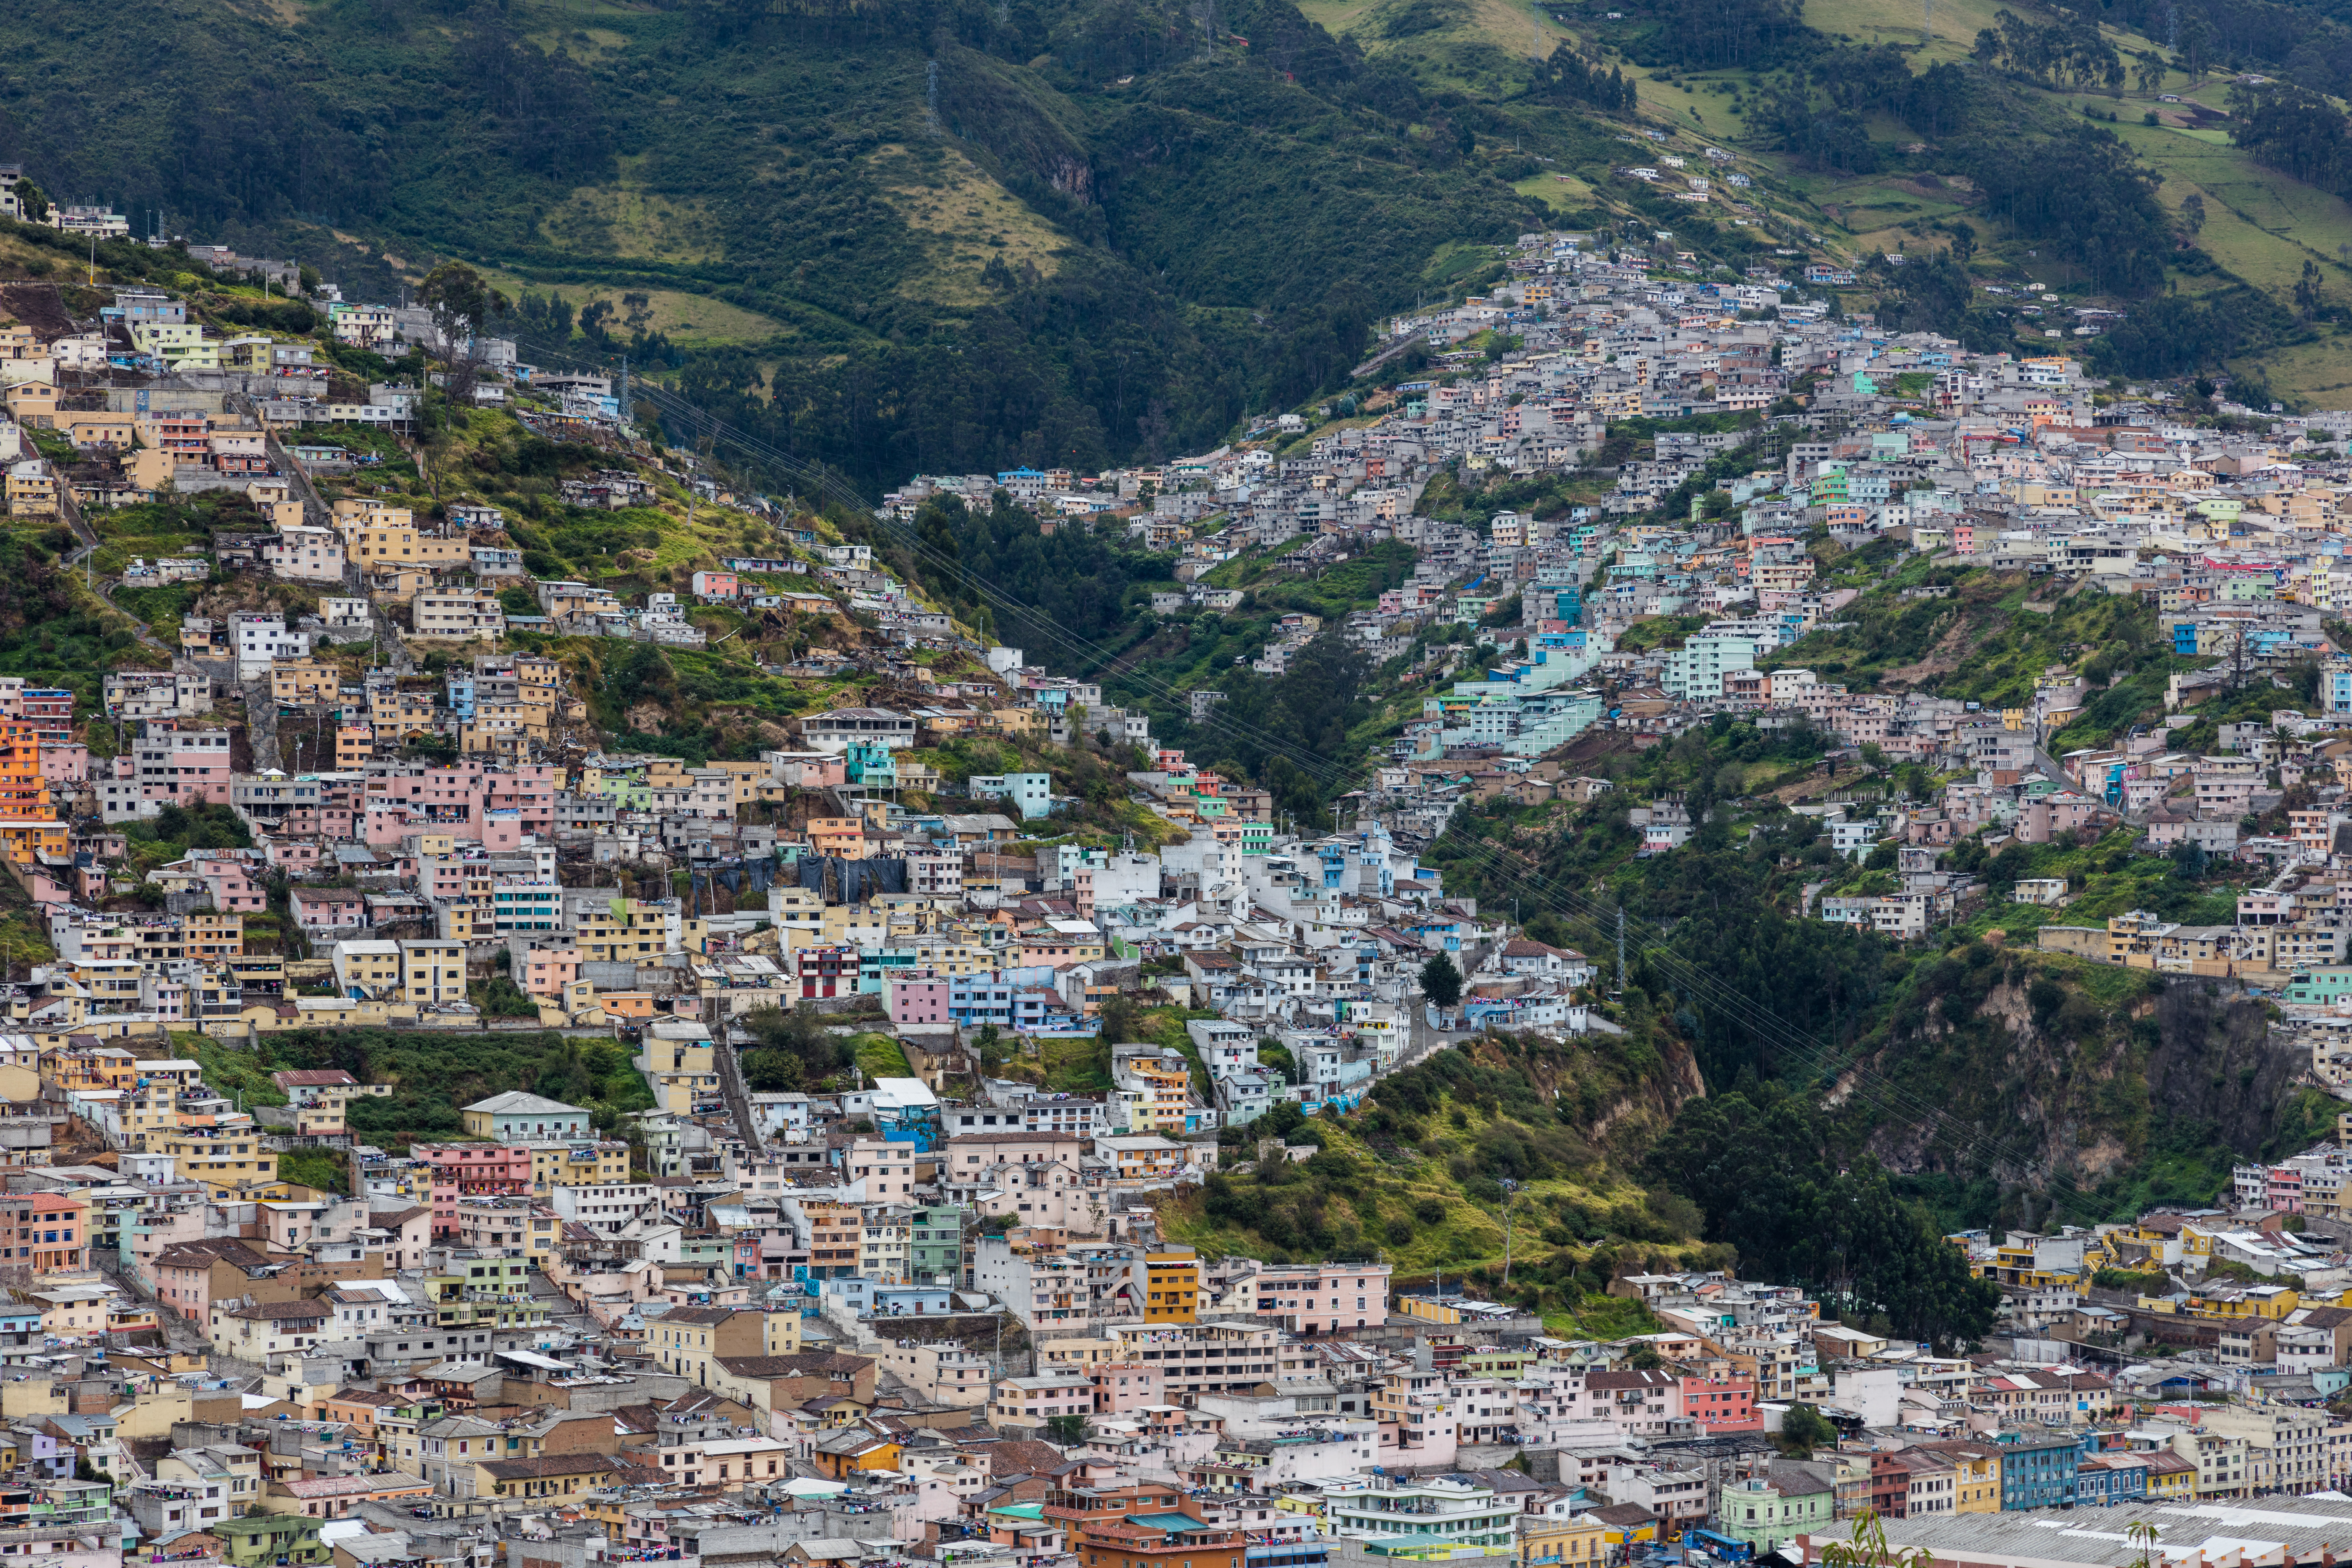 Quito Ecuador Dating Site Free Online Dating in Quito Ecuador PI